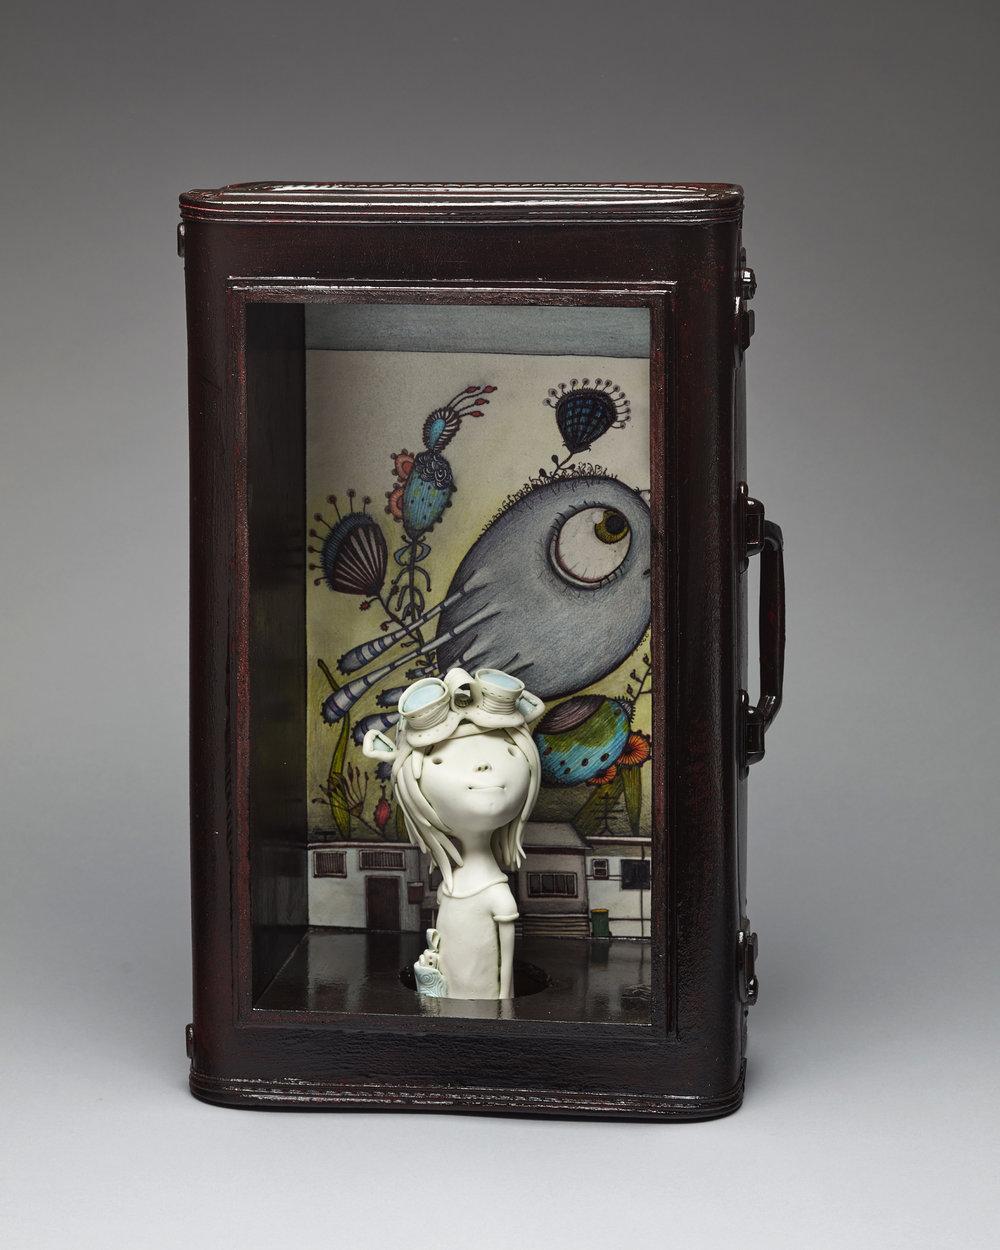 'Heidi's bigger-on-the-inside suitcase'   W 37cm x H 57cm x D 20cm   Porcelain, found object 2017